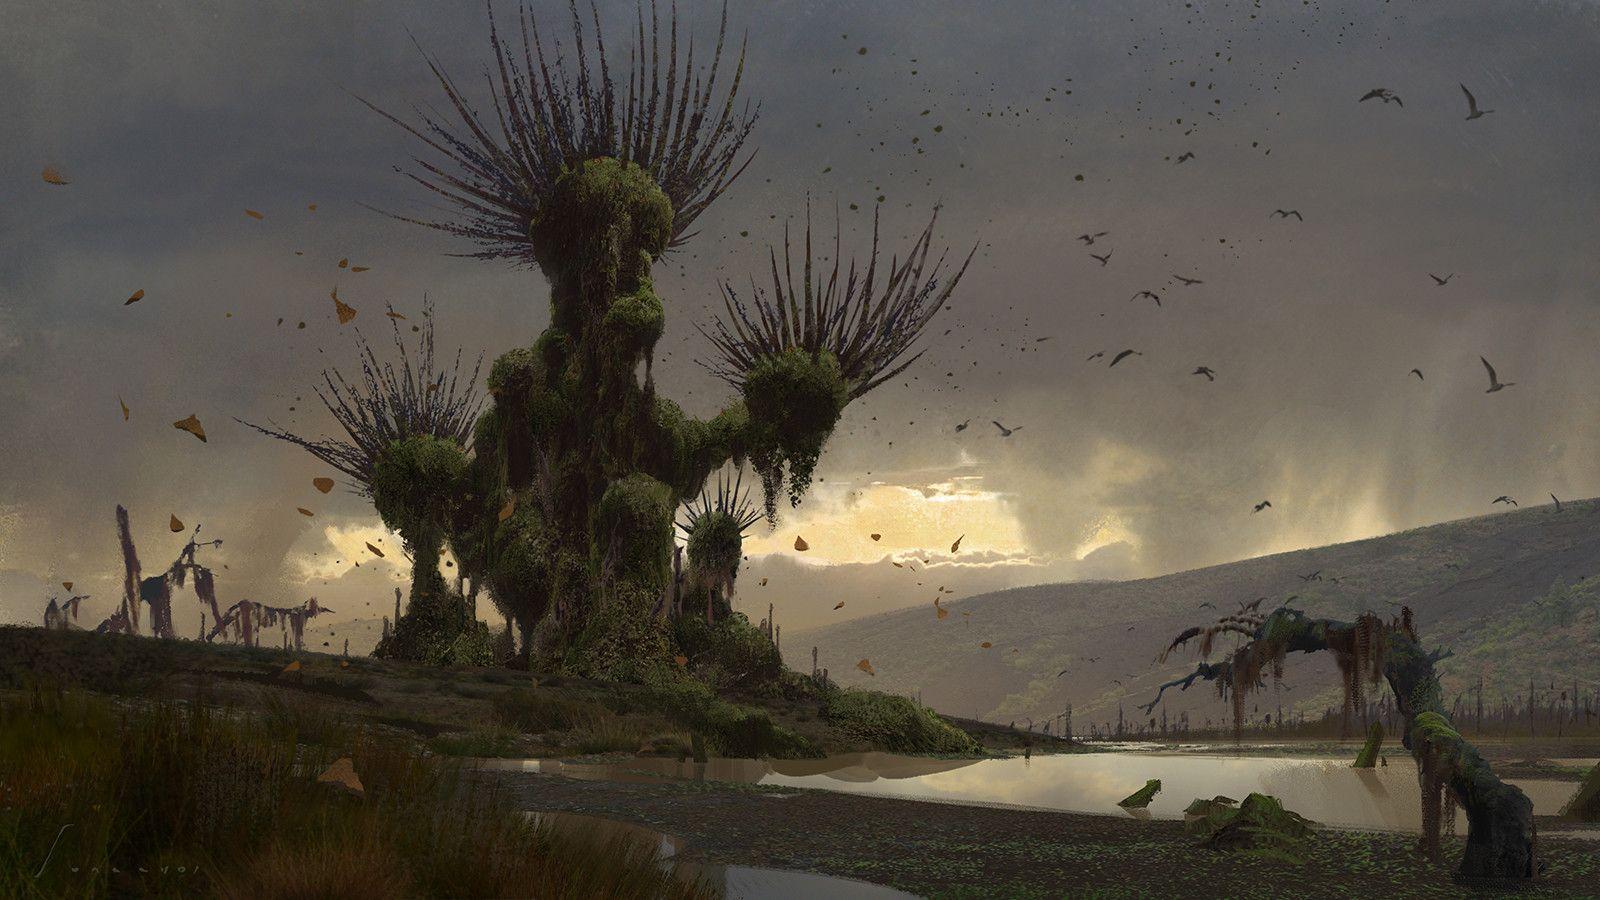 ArtStation - Fungal Tree, Sung Choi